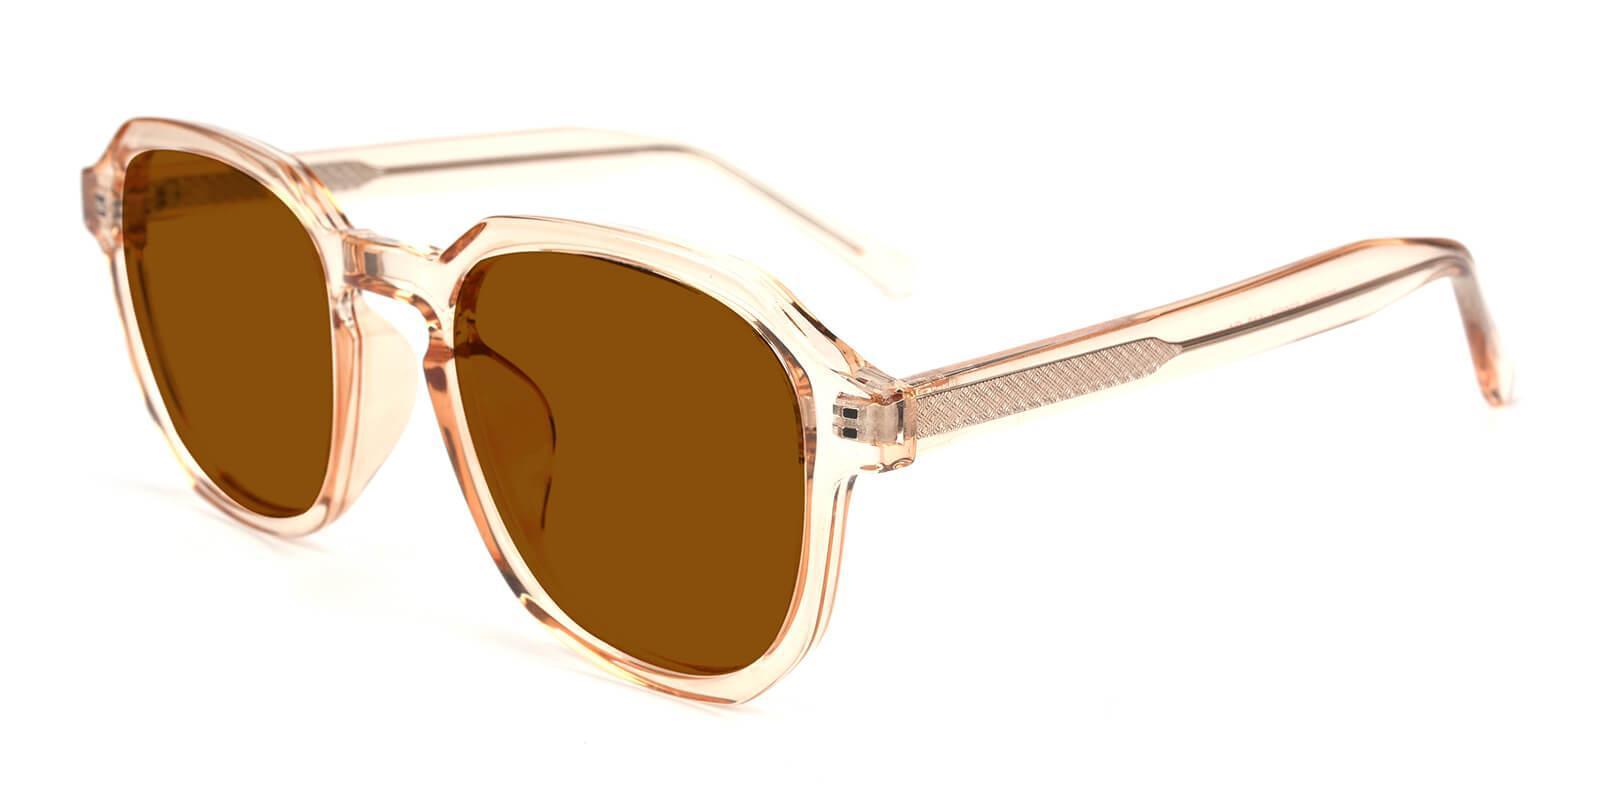 Kasia Orange Acetate SpringHinges , Sunglasses , UniversalBridgeFit Frames from ABBE Glasses